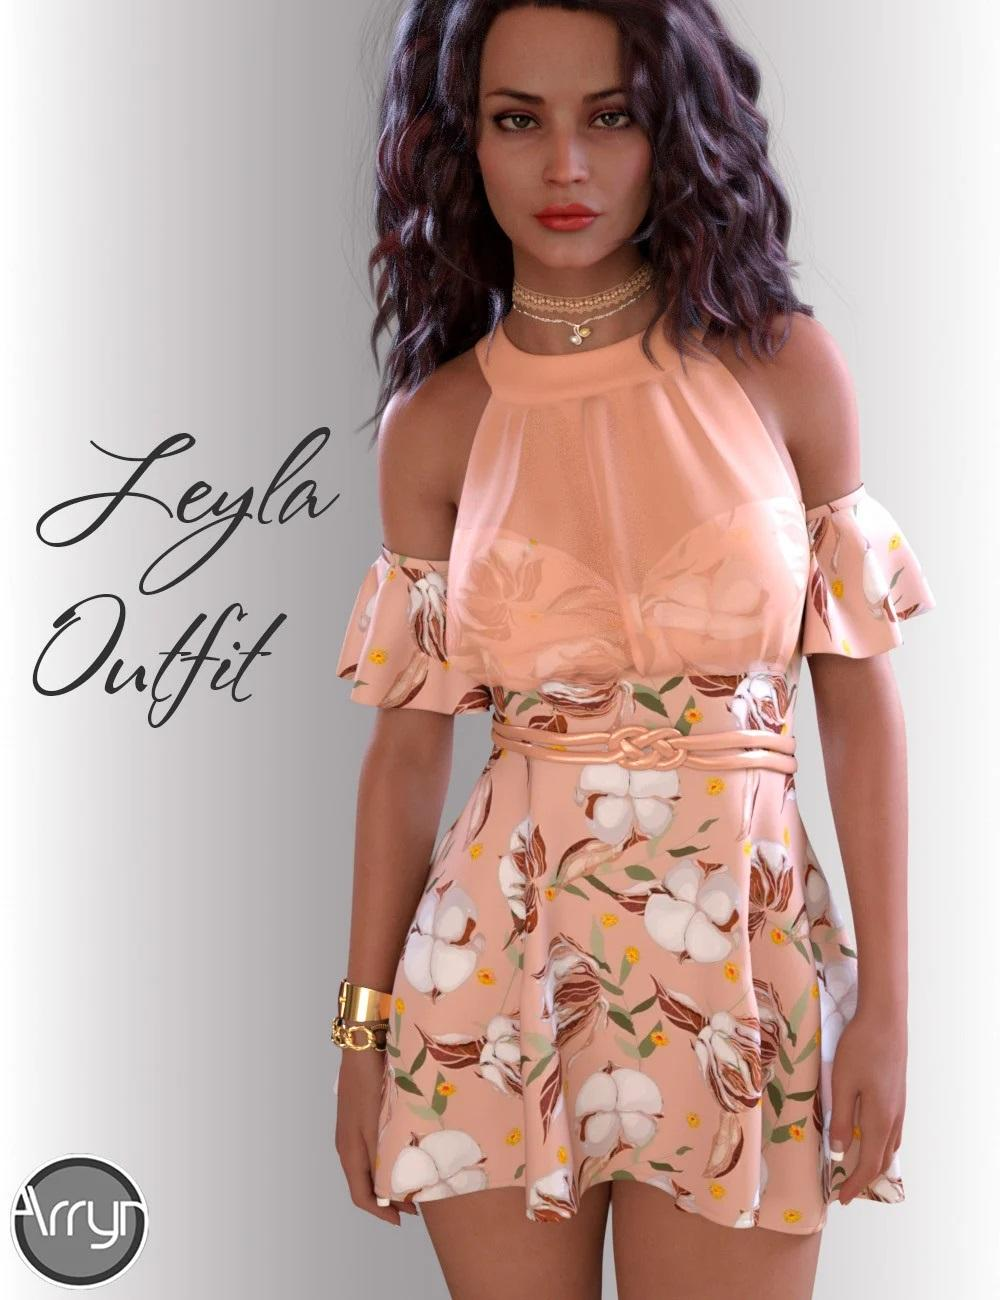 dForce Leyla Outfit for Genesis 8 Females